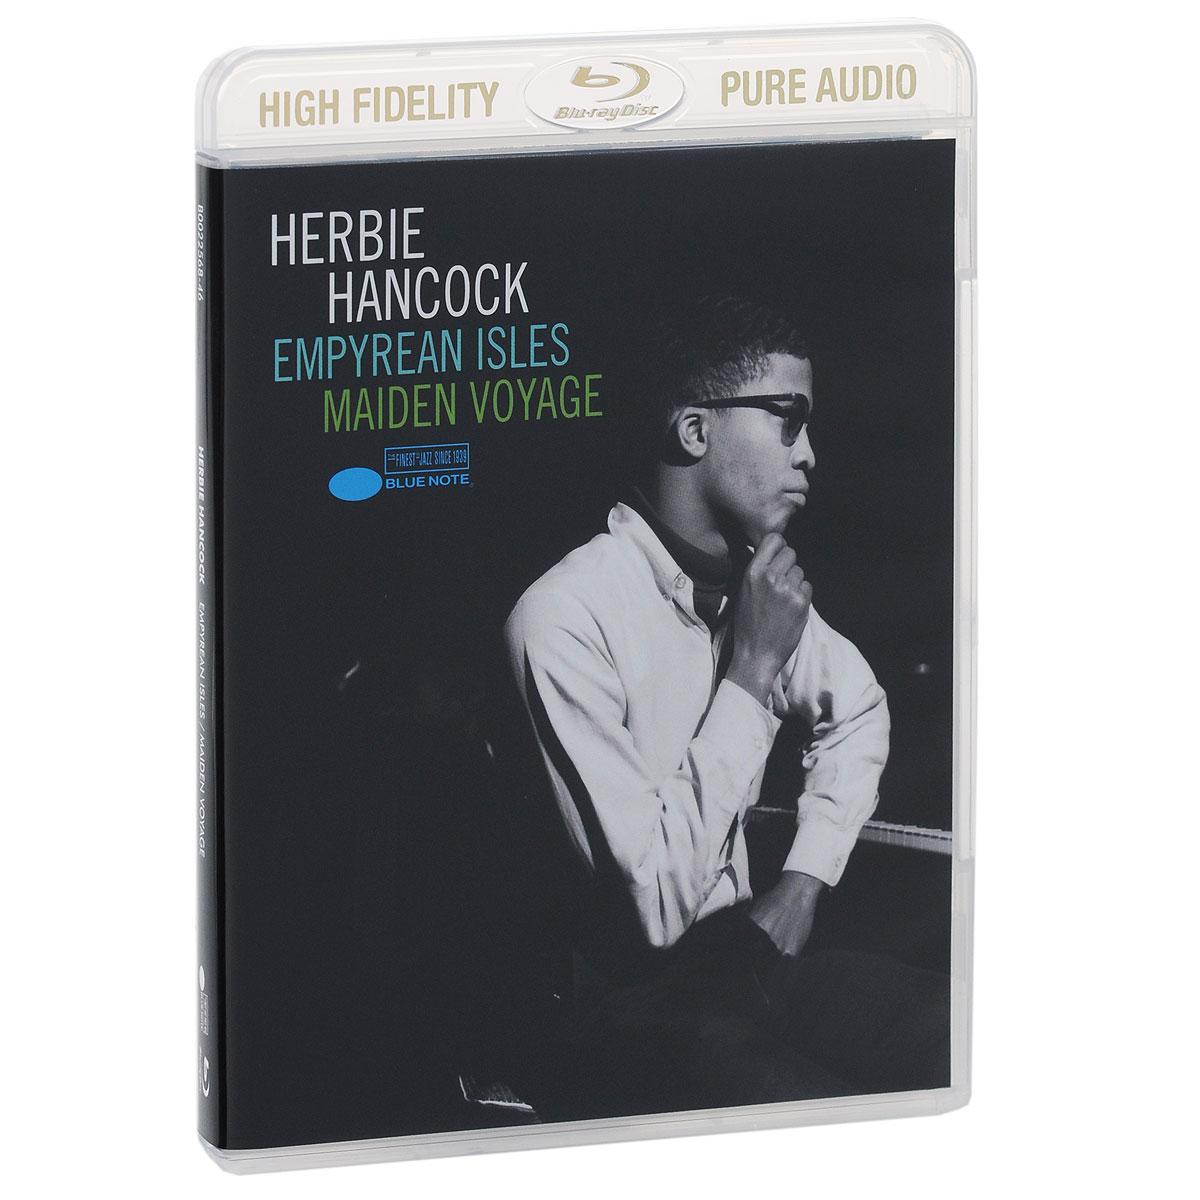 Херби Хэнкок,Фредди Хаббард,Джордж Коулмен,Рон Картер,Энтони Вильямс Herbie Hancock. Empyrean Isles / Maiden Voyage (Blu-ray Audio) цена